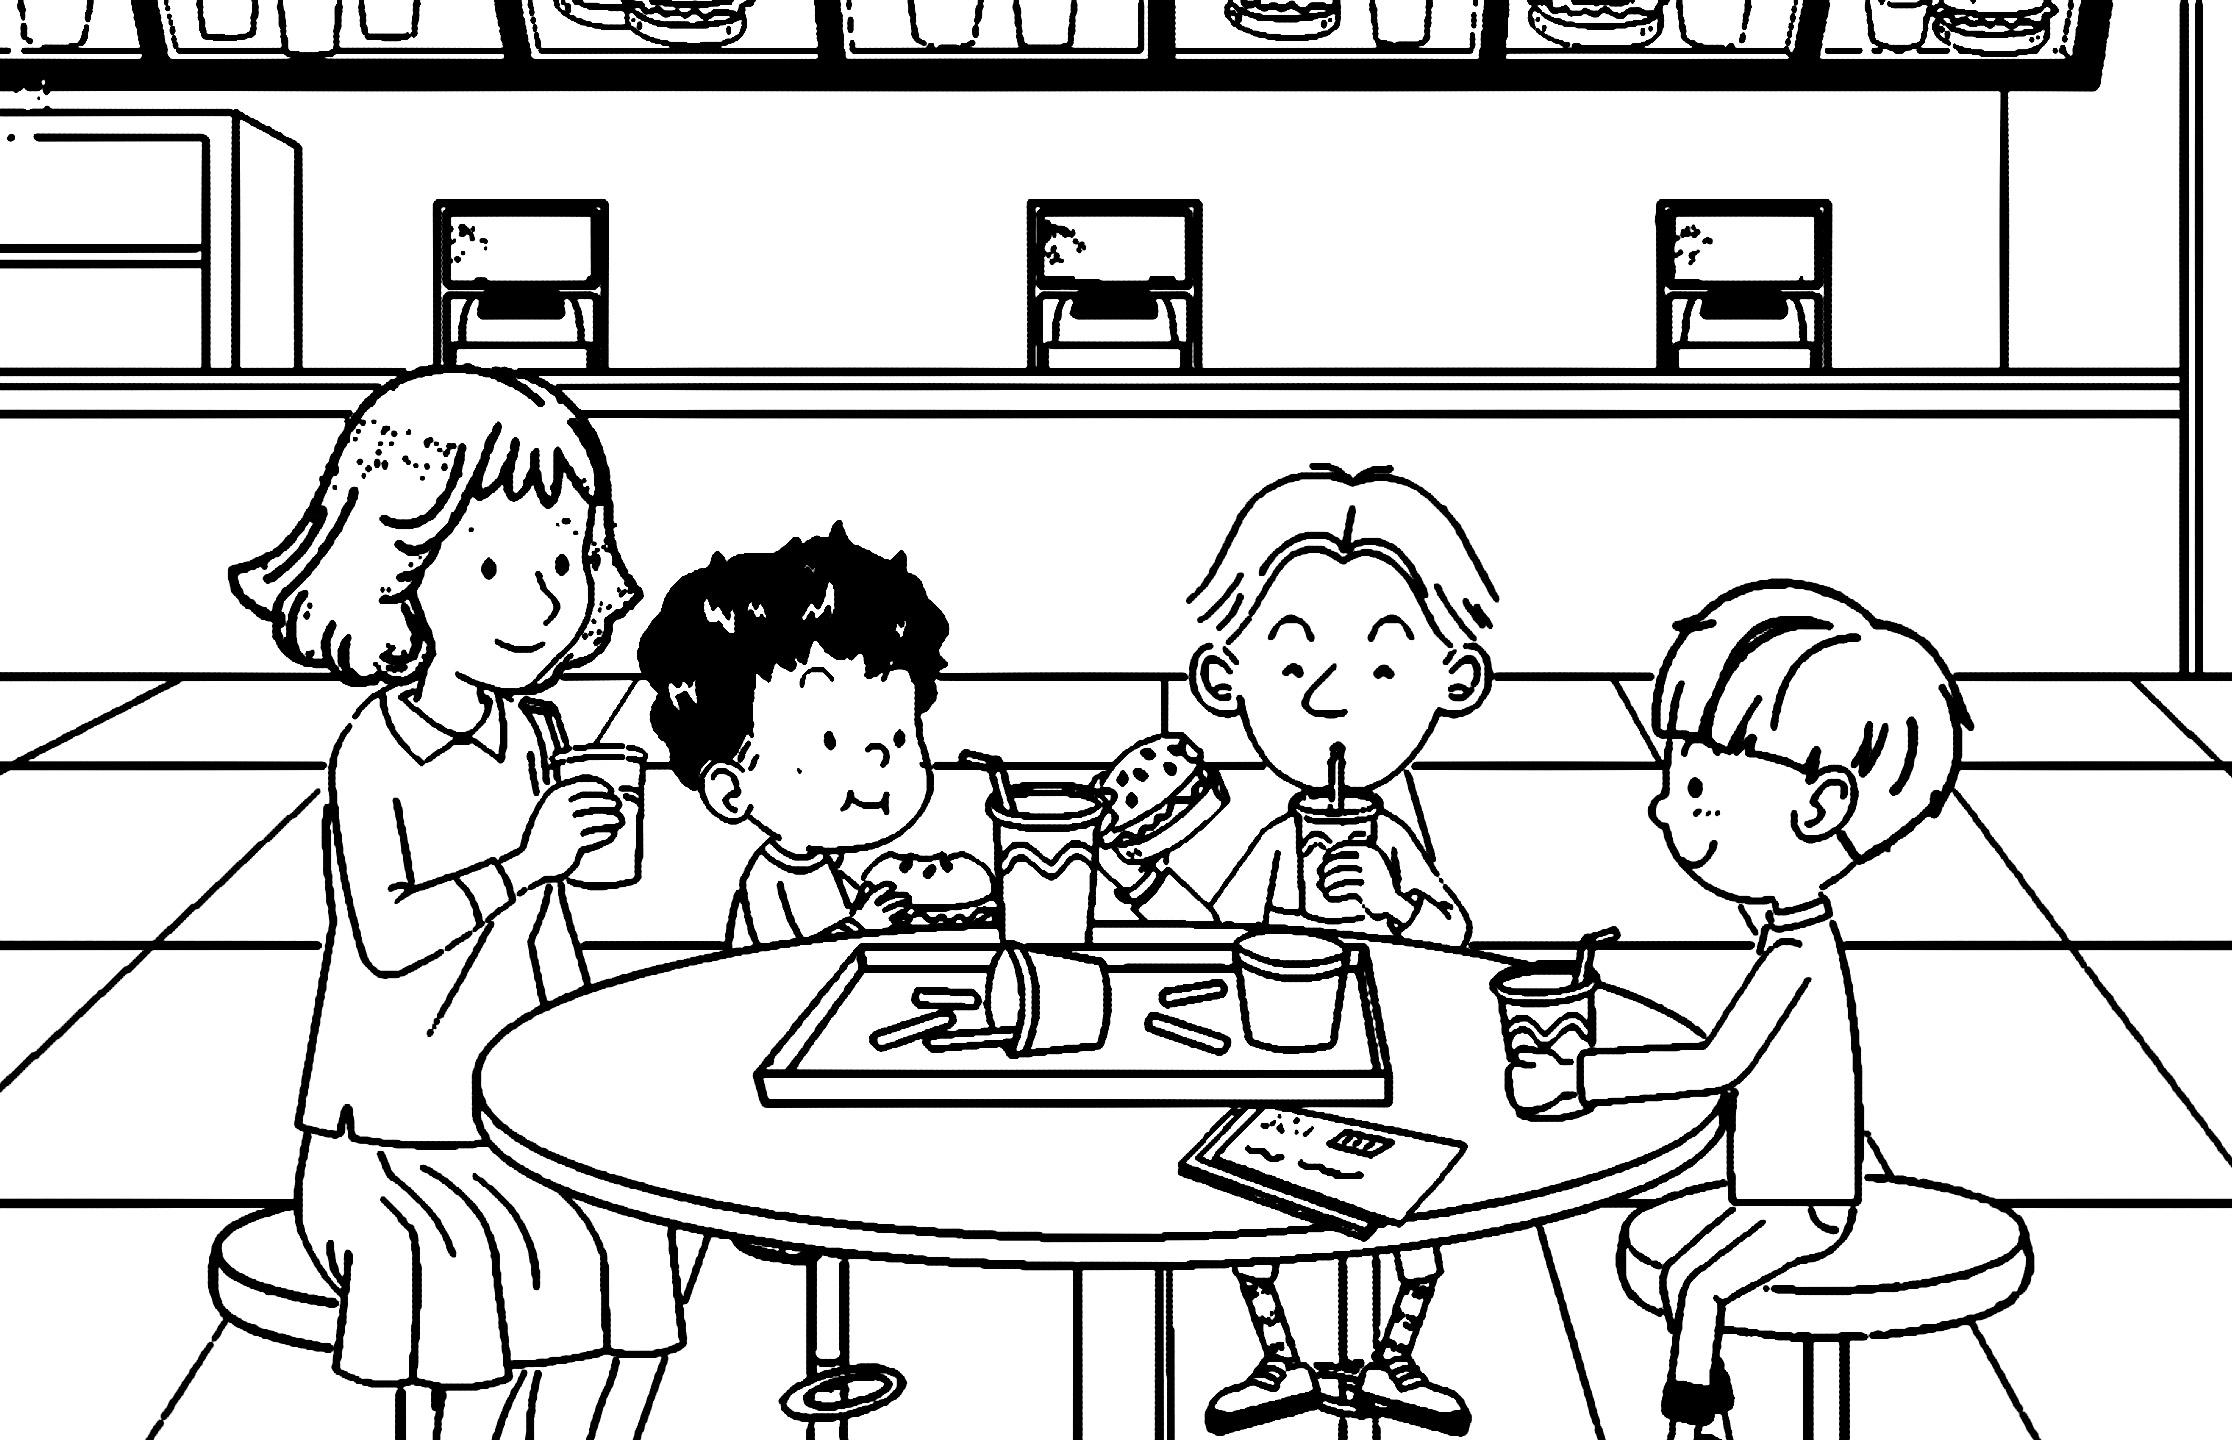 Speaking Cartoon Kids Coloring Page 50